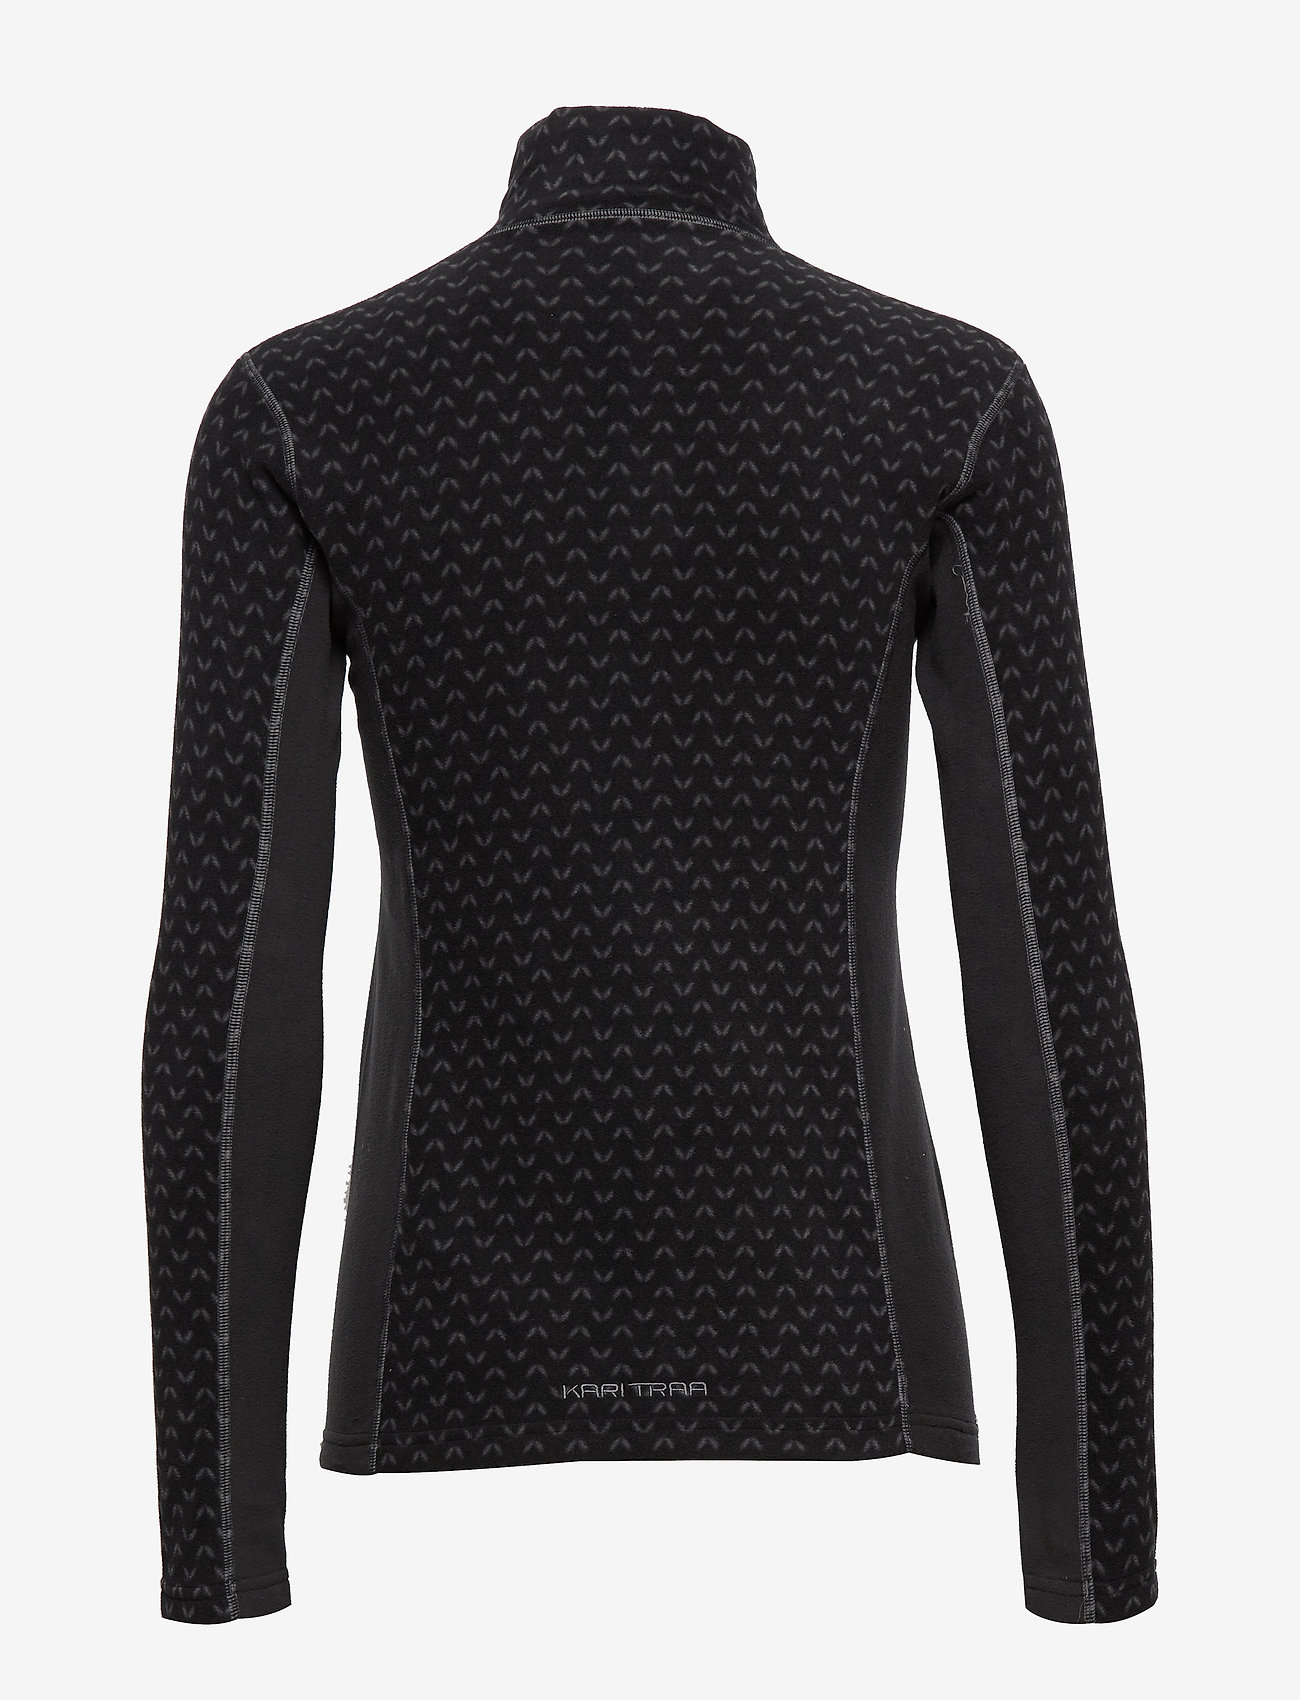 Kari Traa Lus Fleece - Sweats Black